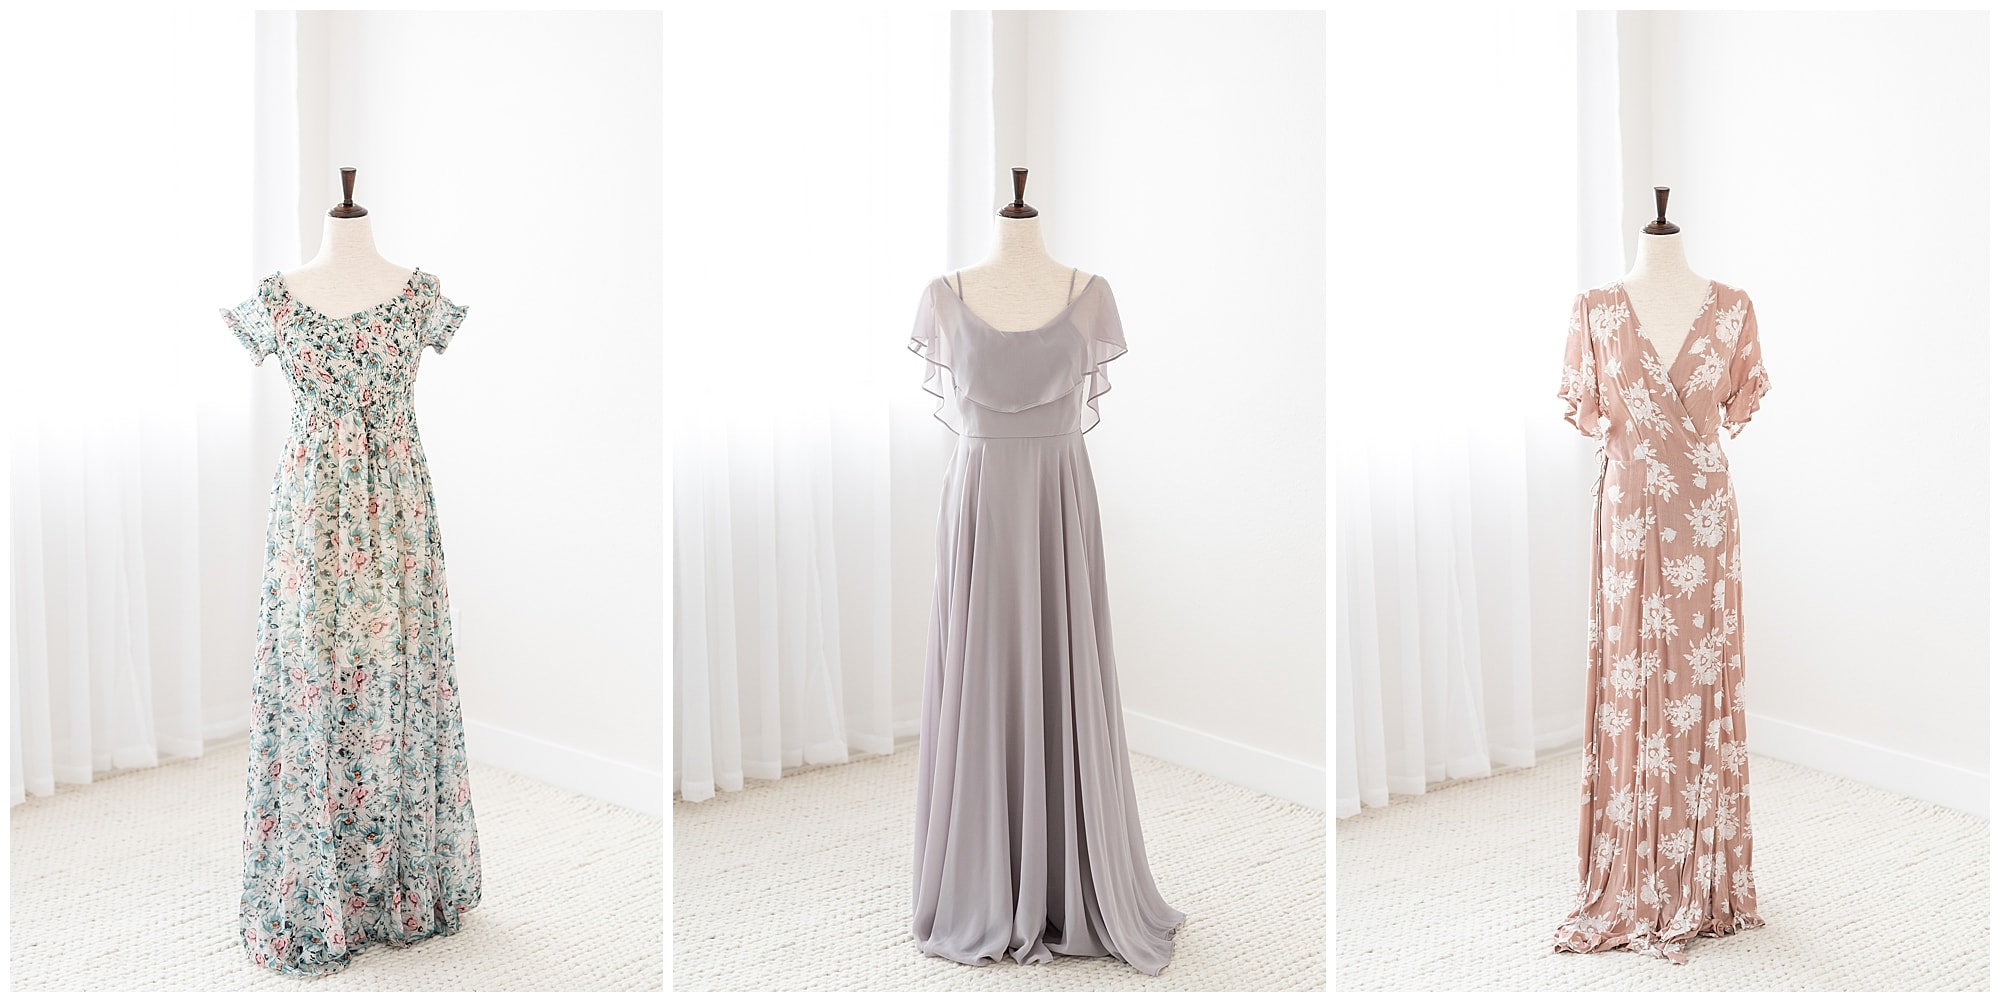 Frisco Photographer Studio Wardrobe Options